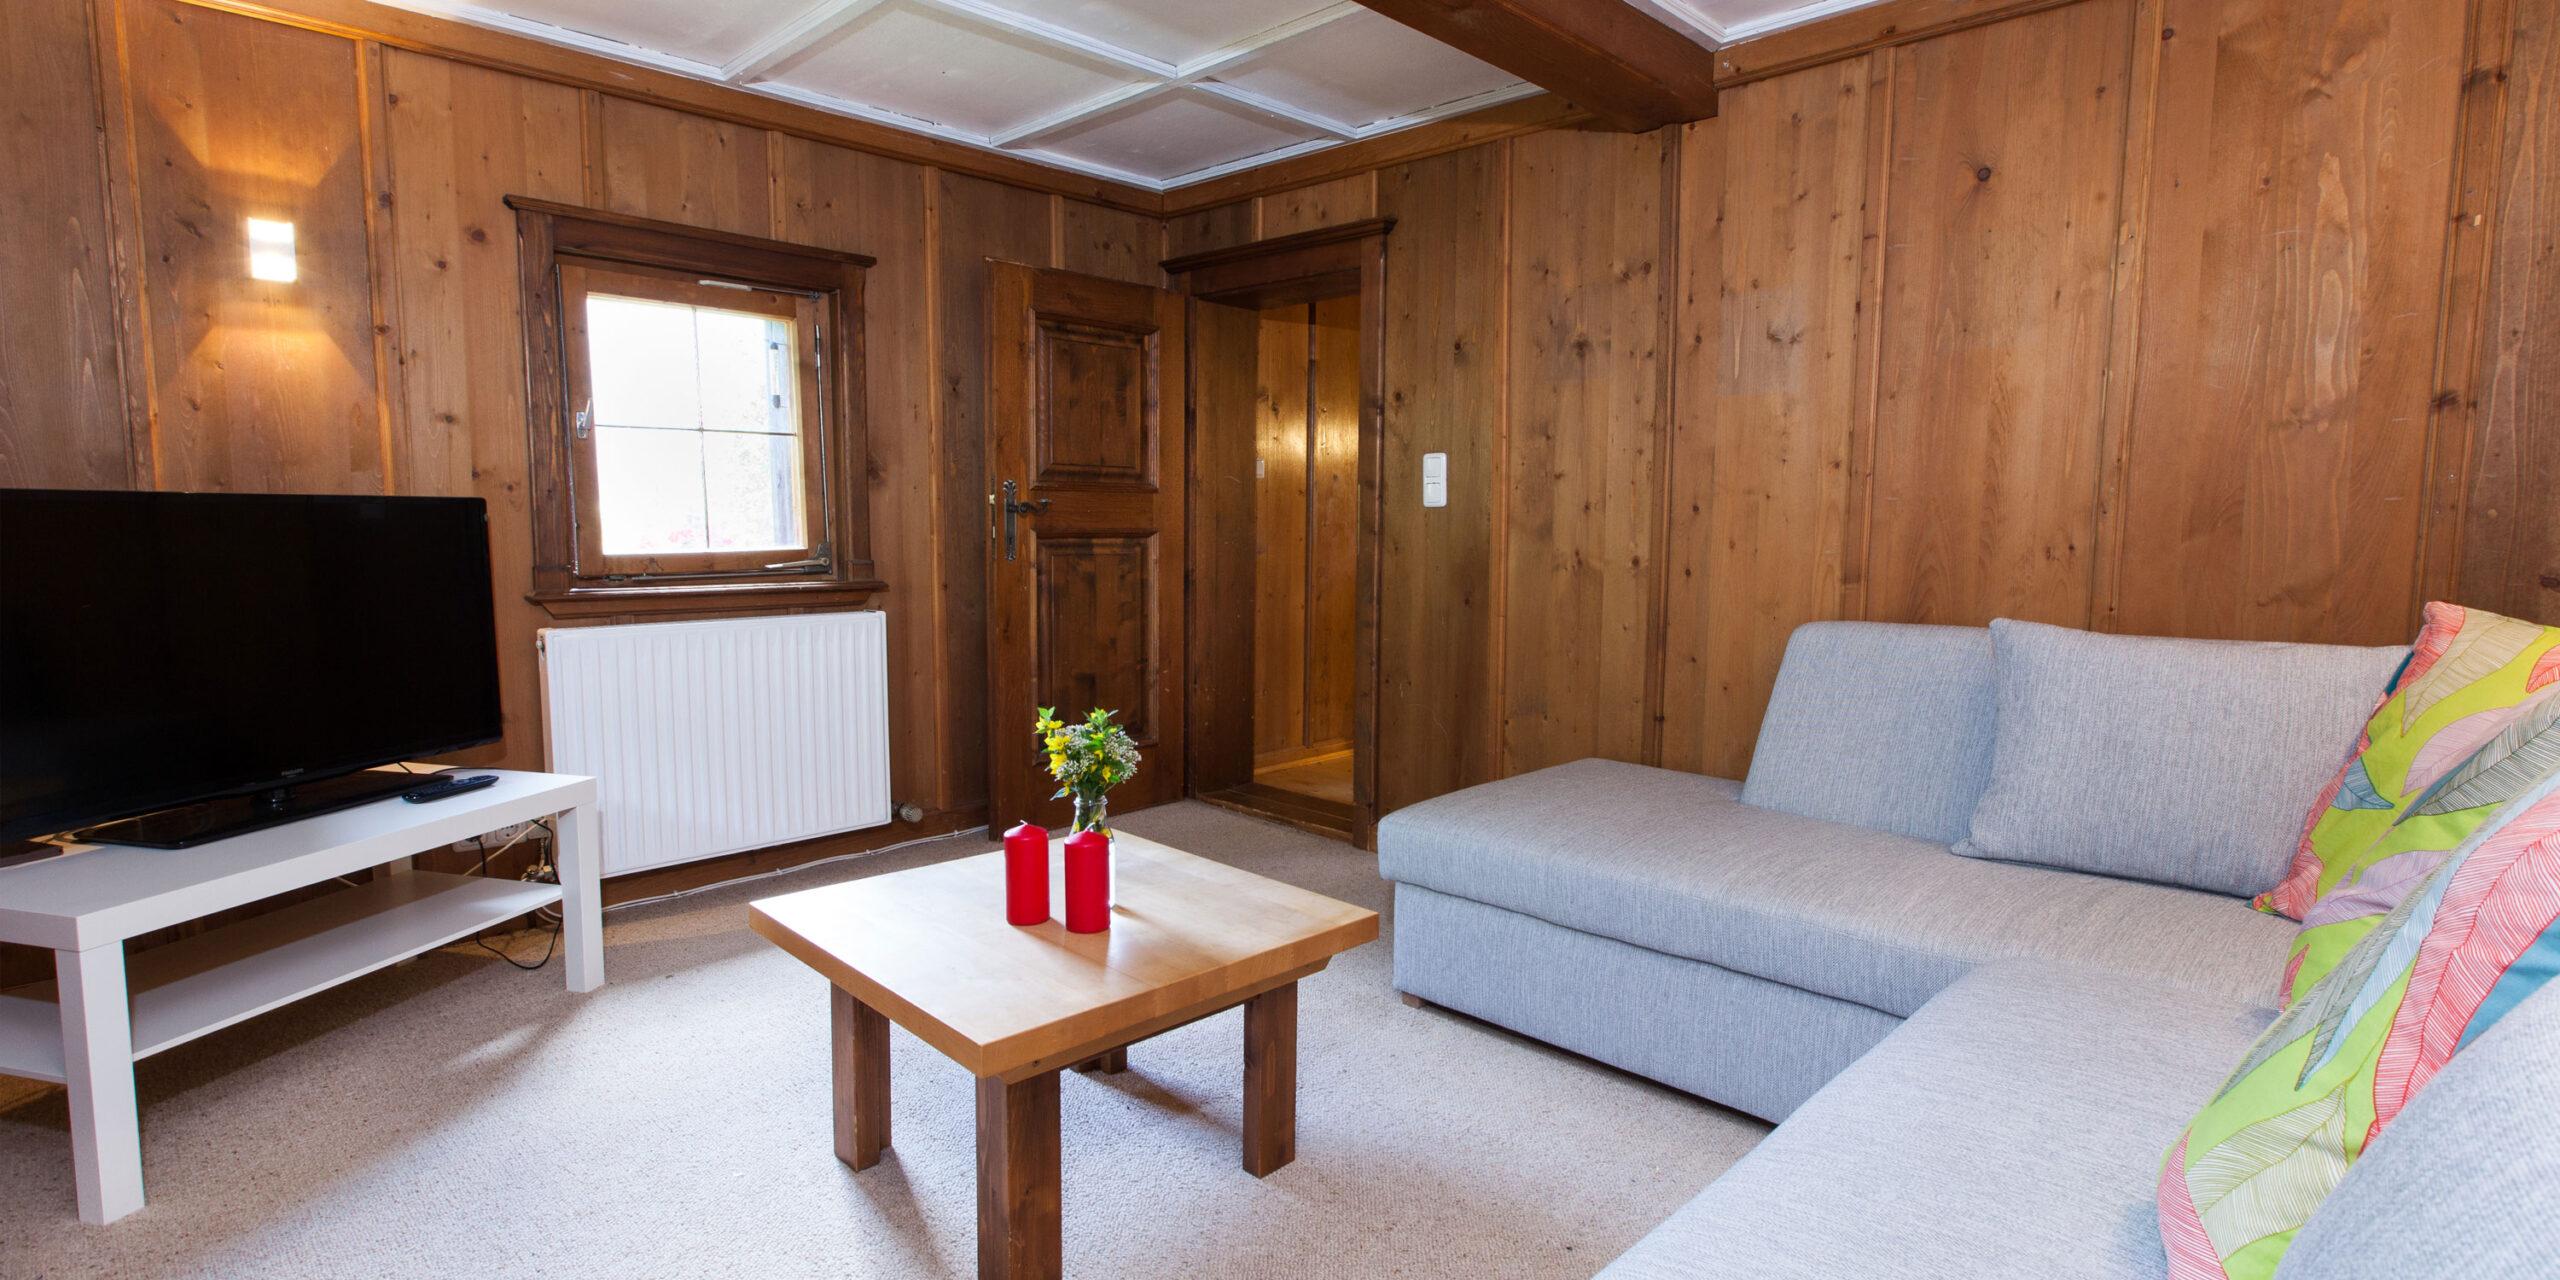 berg-7-wohnzimmer-og-gallery